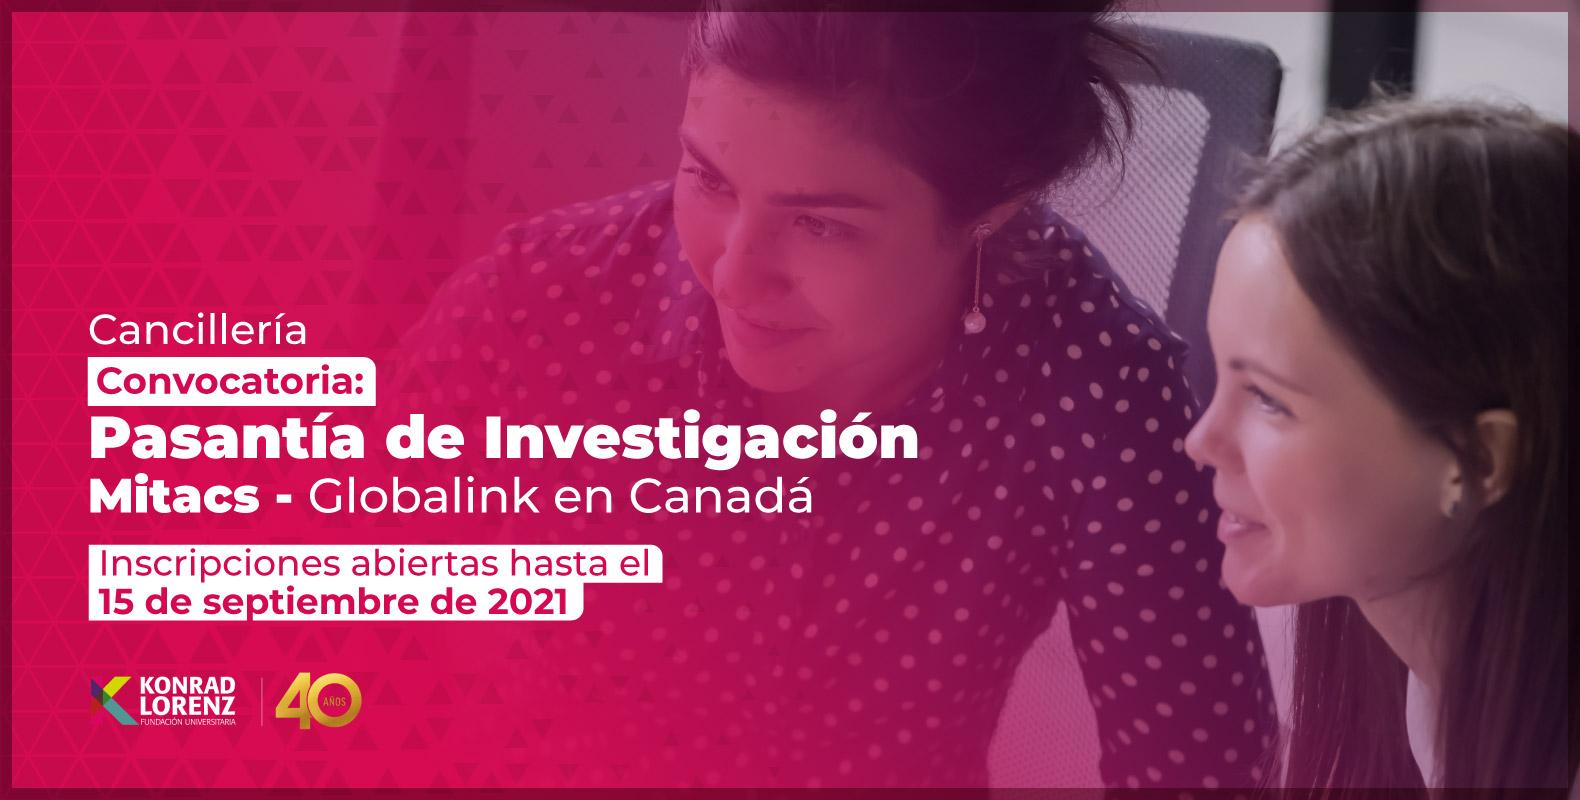 Convocatoria: Pasantía de Investigación Mitacs - Globalink en Canadá